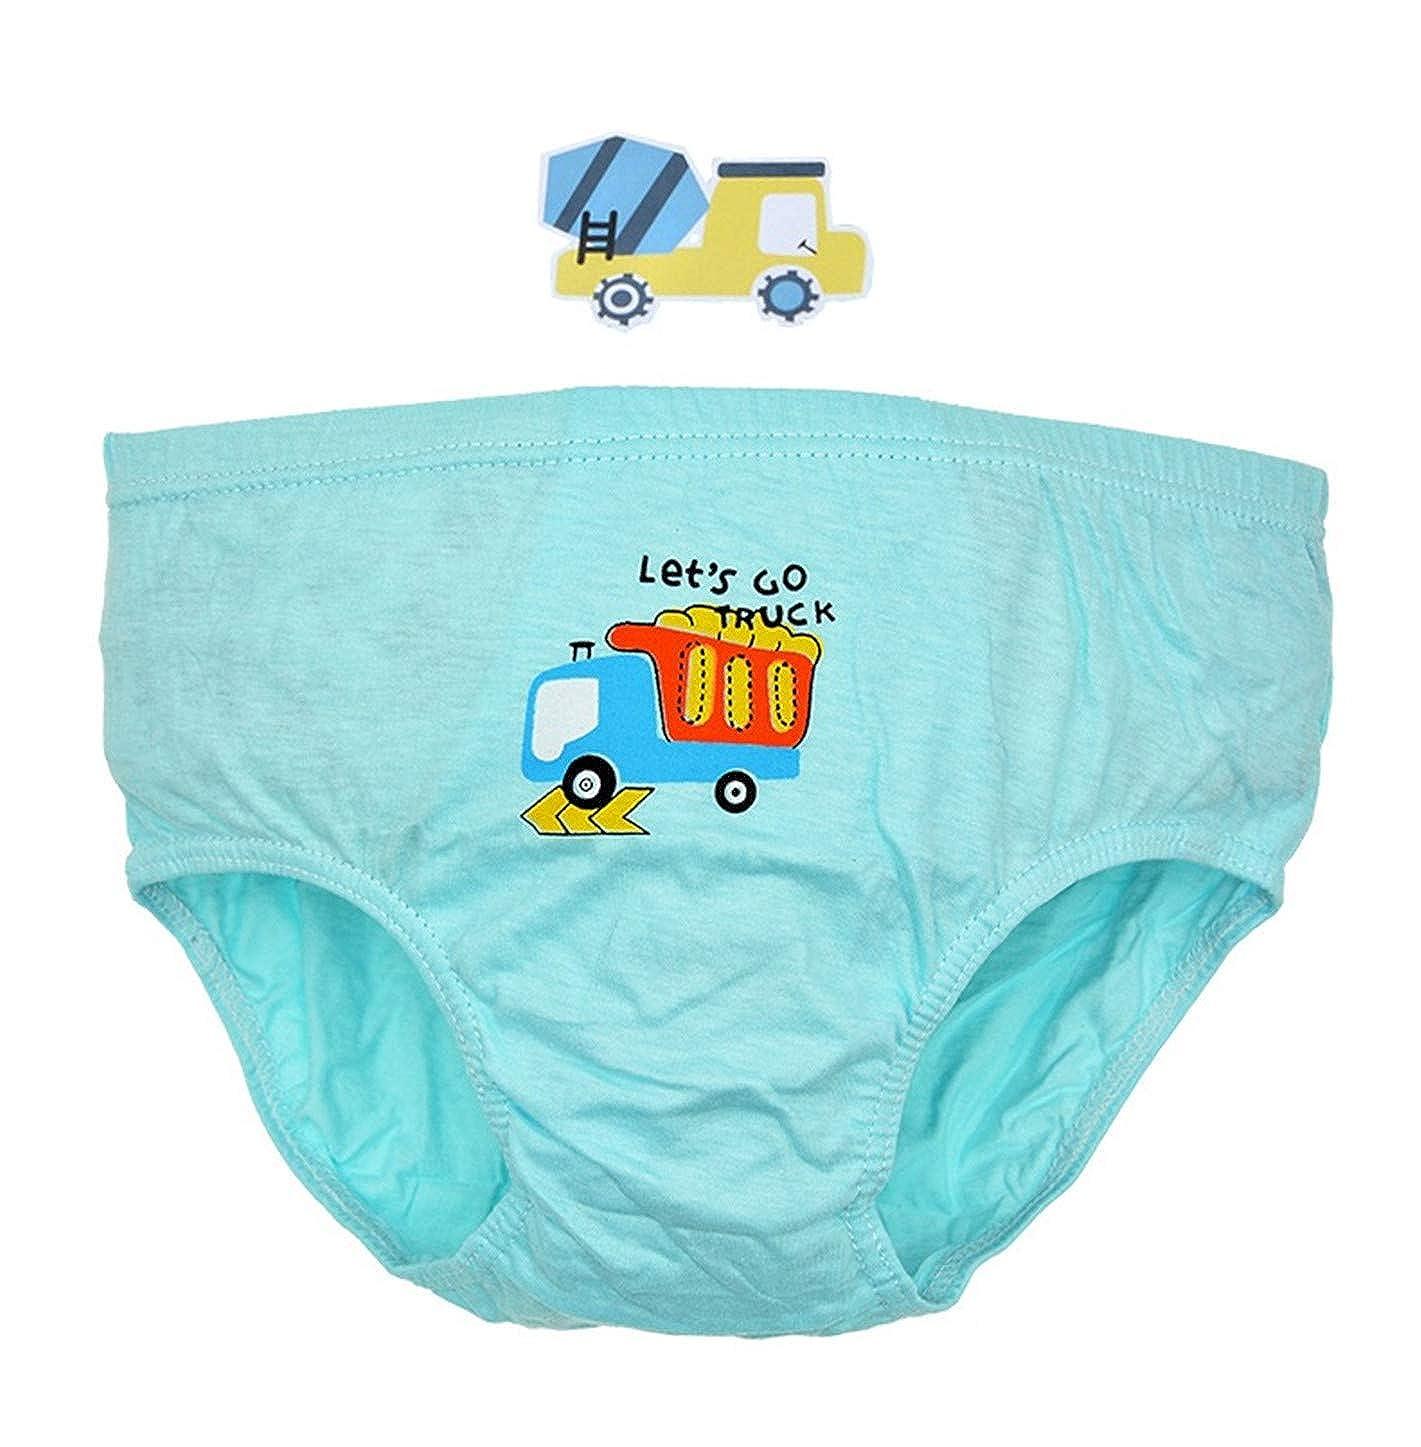 Pack Of 5 Fashion 1938 Boys Cartoon Printed Briefs 100 Cotton Underwear For Toddler Boys Clothing Underwear